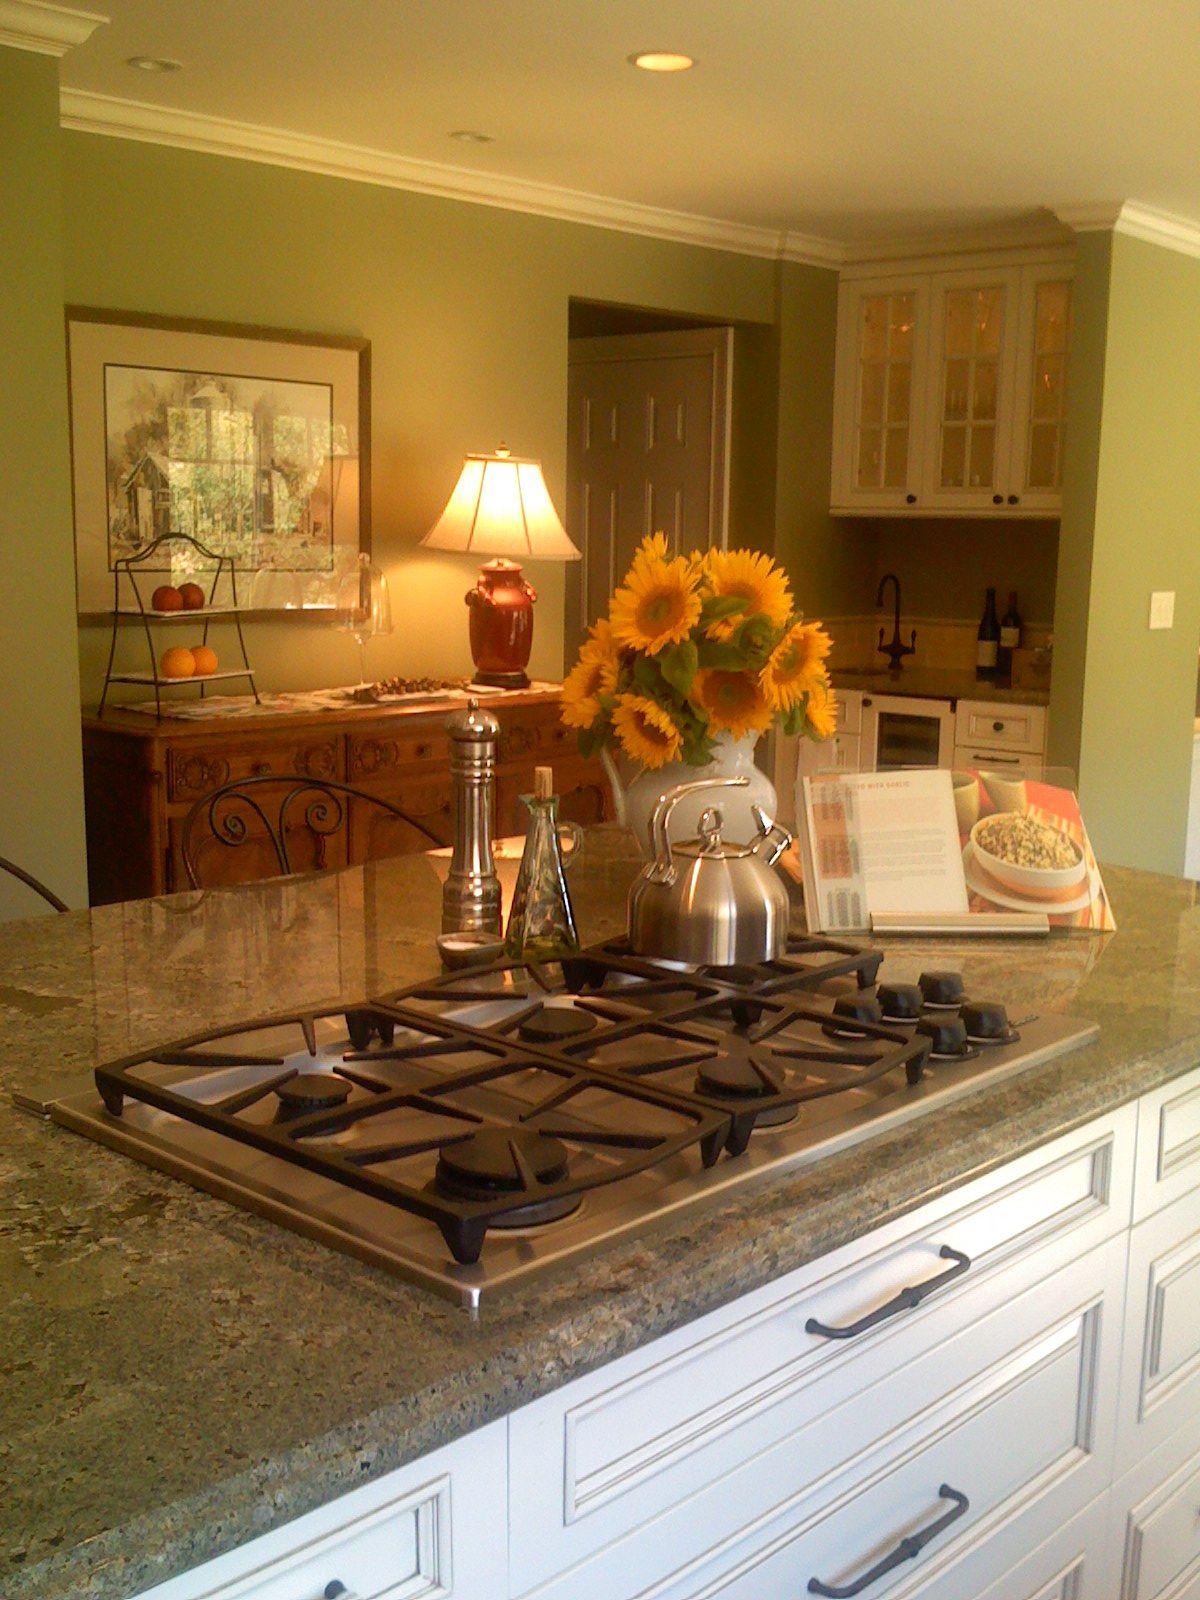 Green Walls And Warm Granite Kitchen Wall Color Home Decor